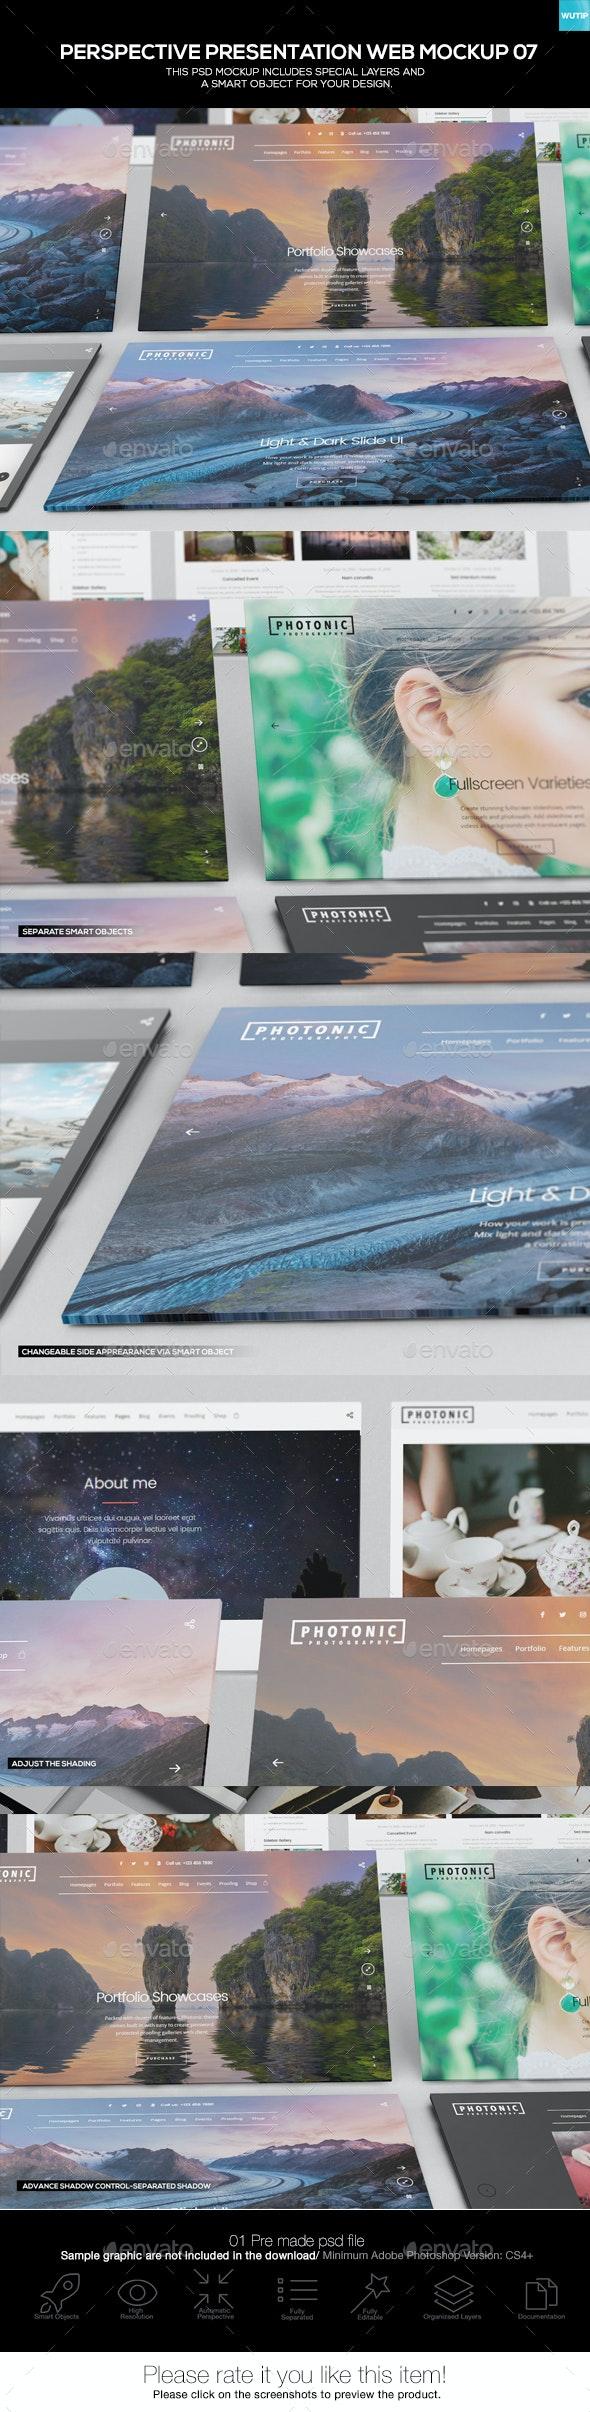 Perspective Presentation Web Mockup 07 - Website Displays